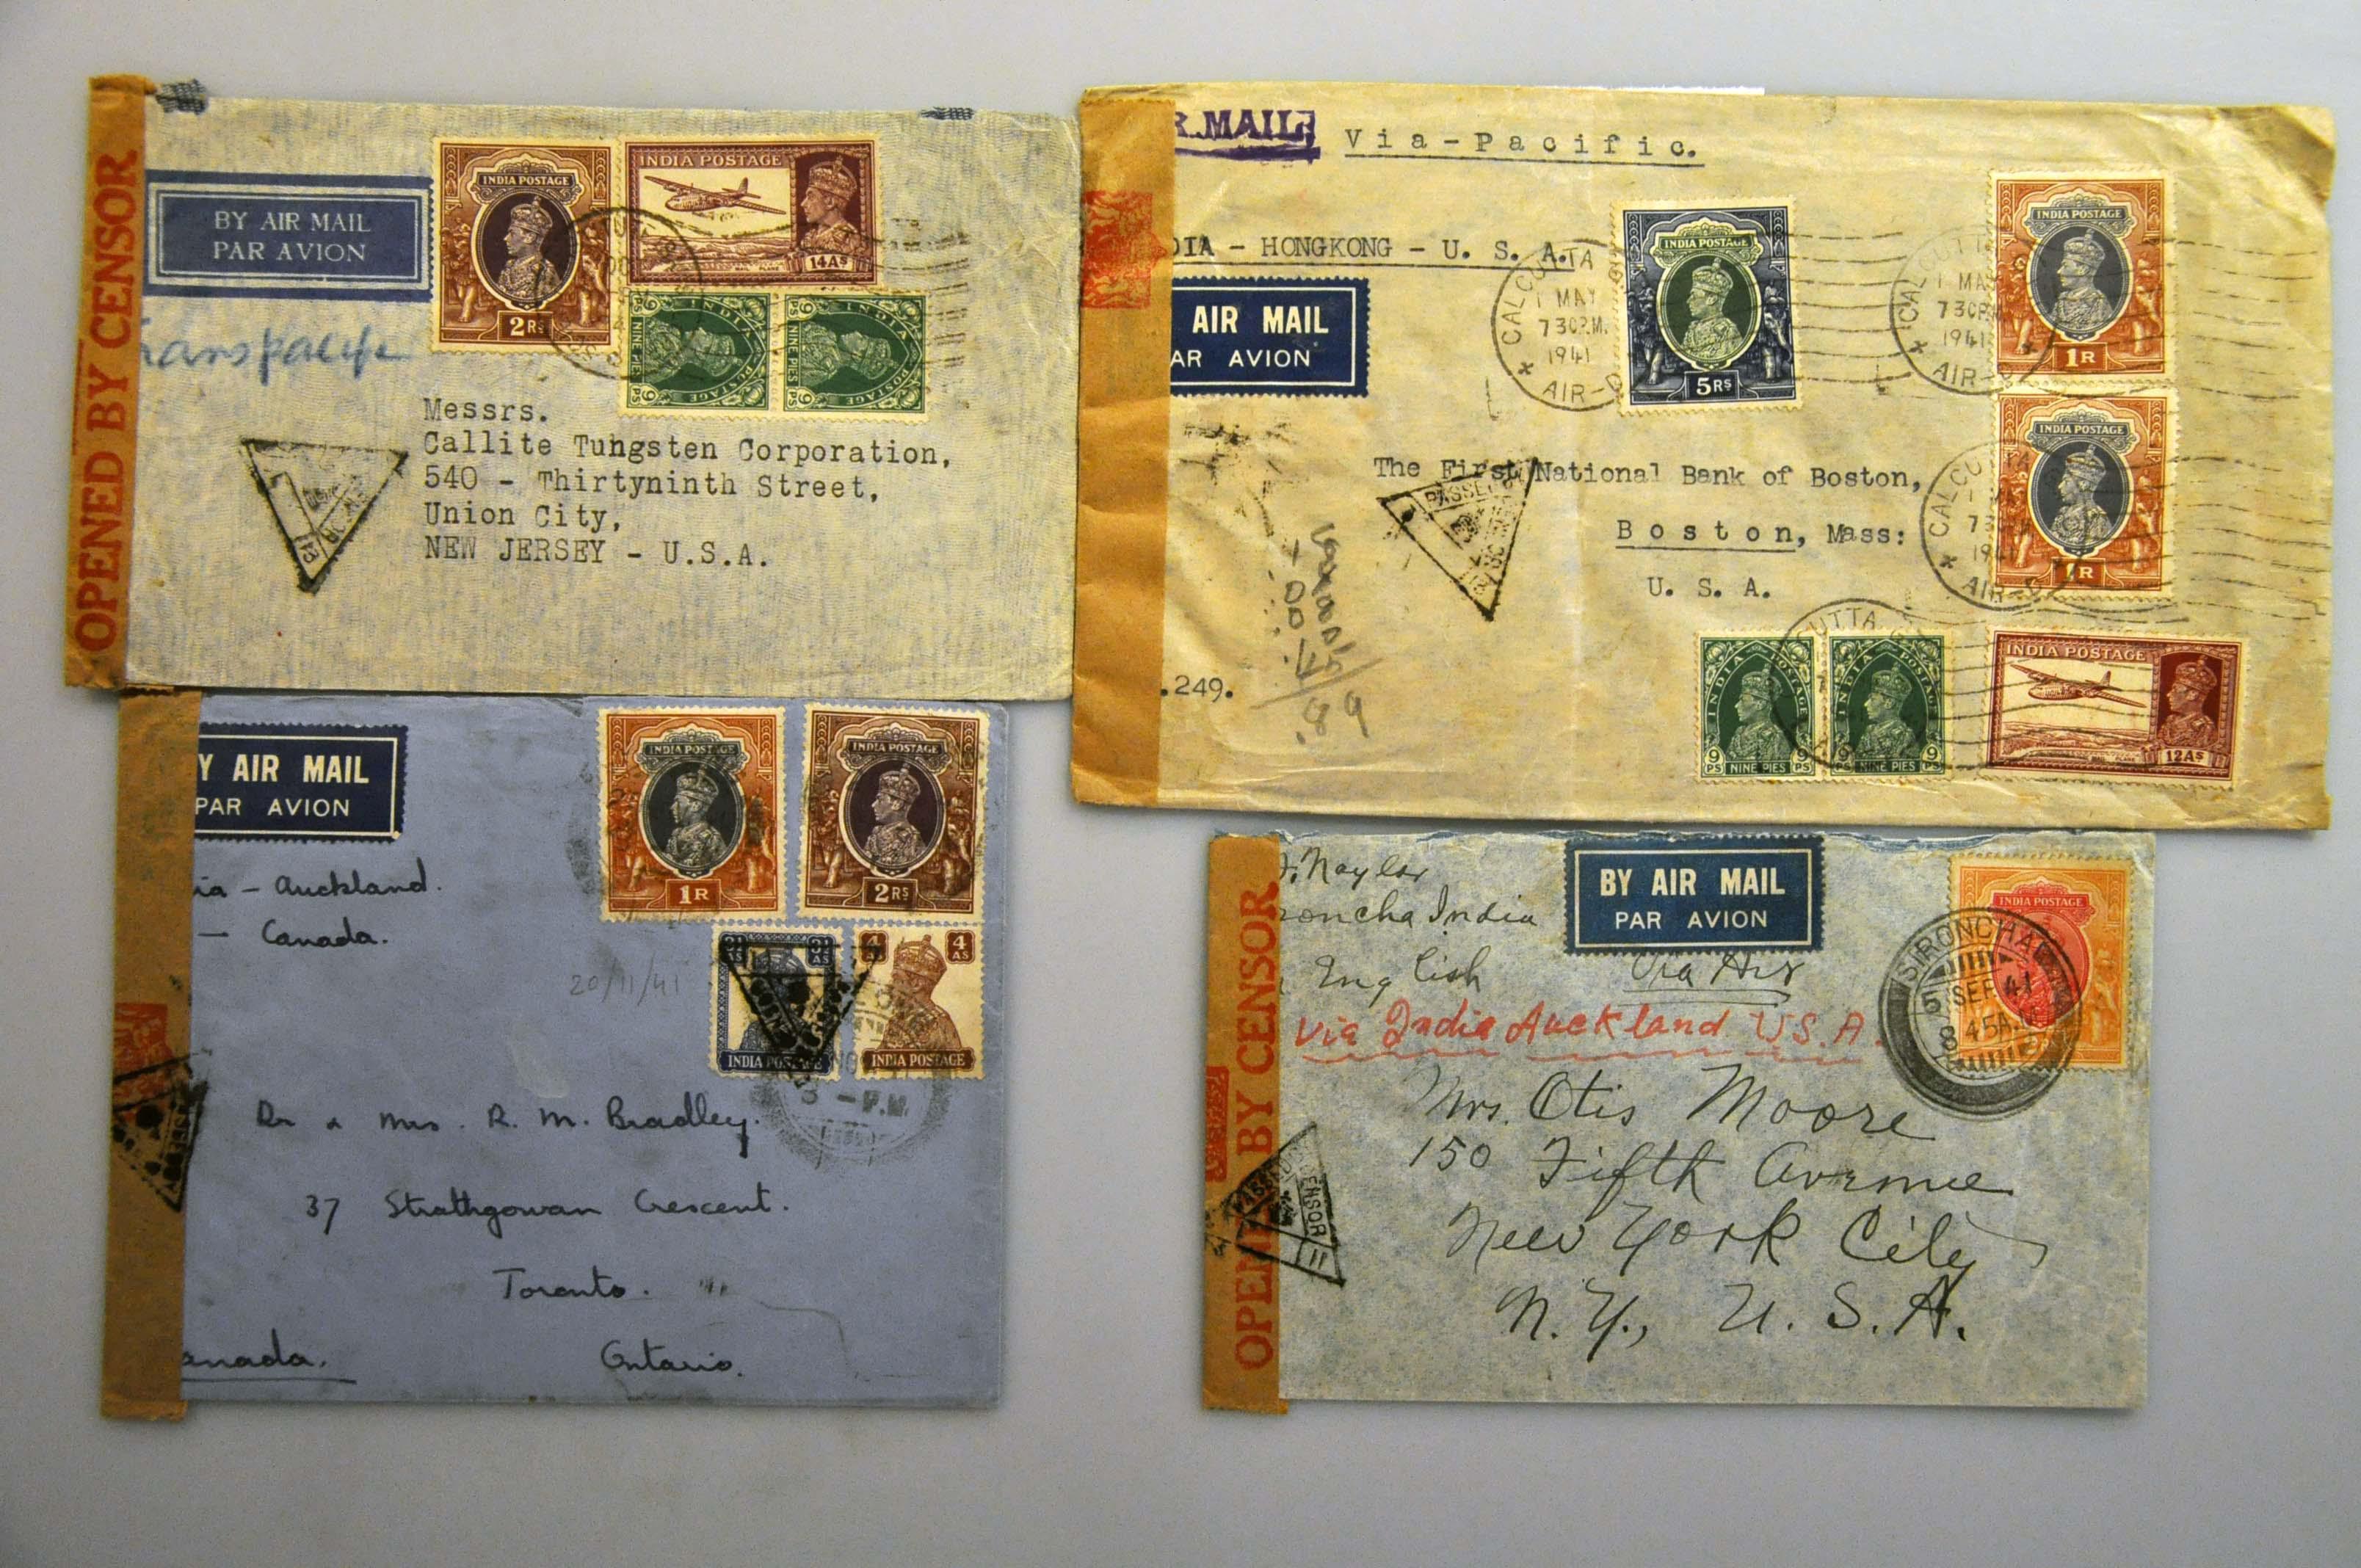 Lot 1161 - Topics and Miscellaneous world war II - Corinphila veilingen  Auction 235: Postal